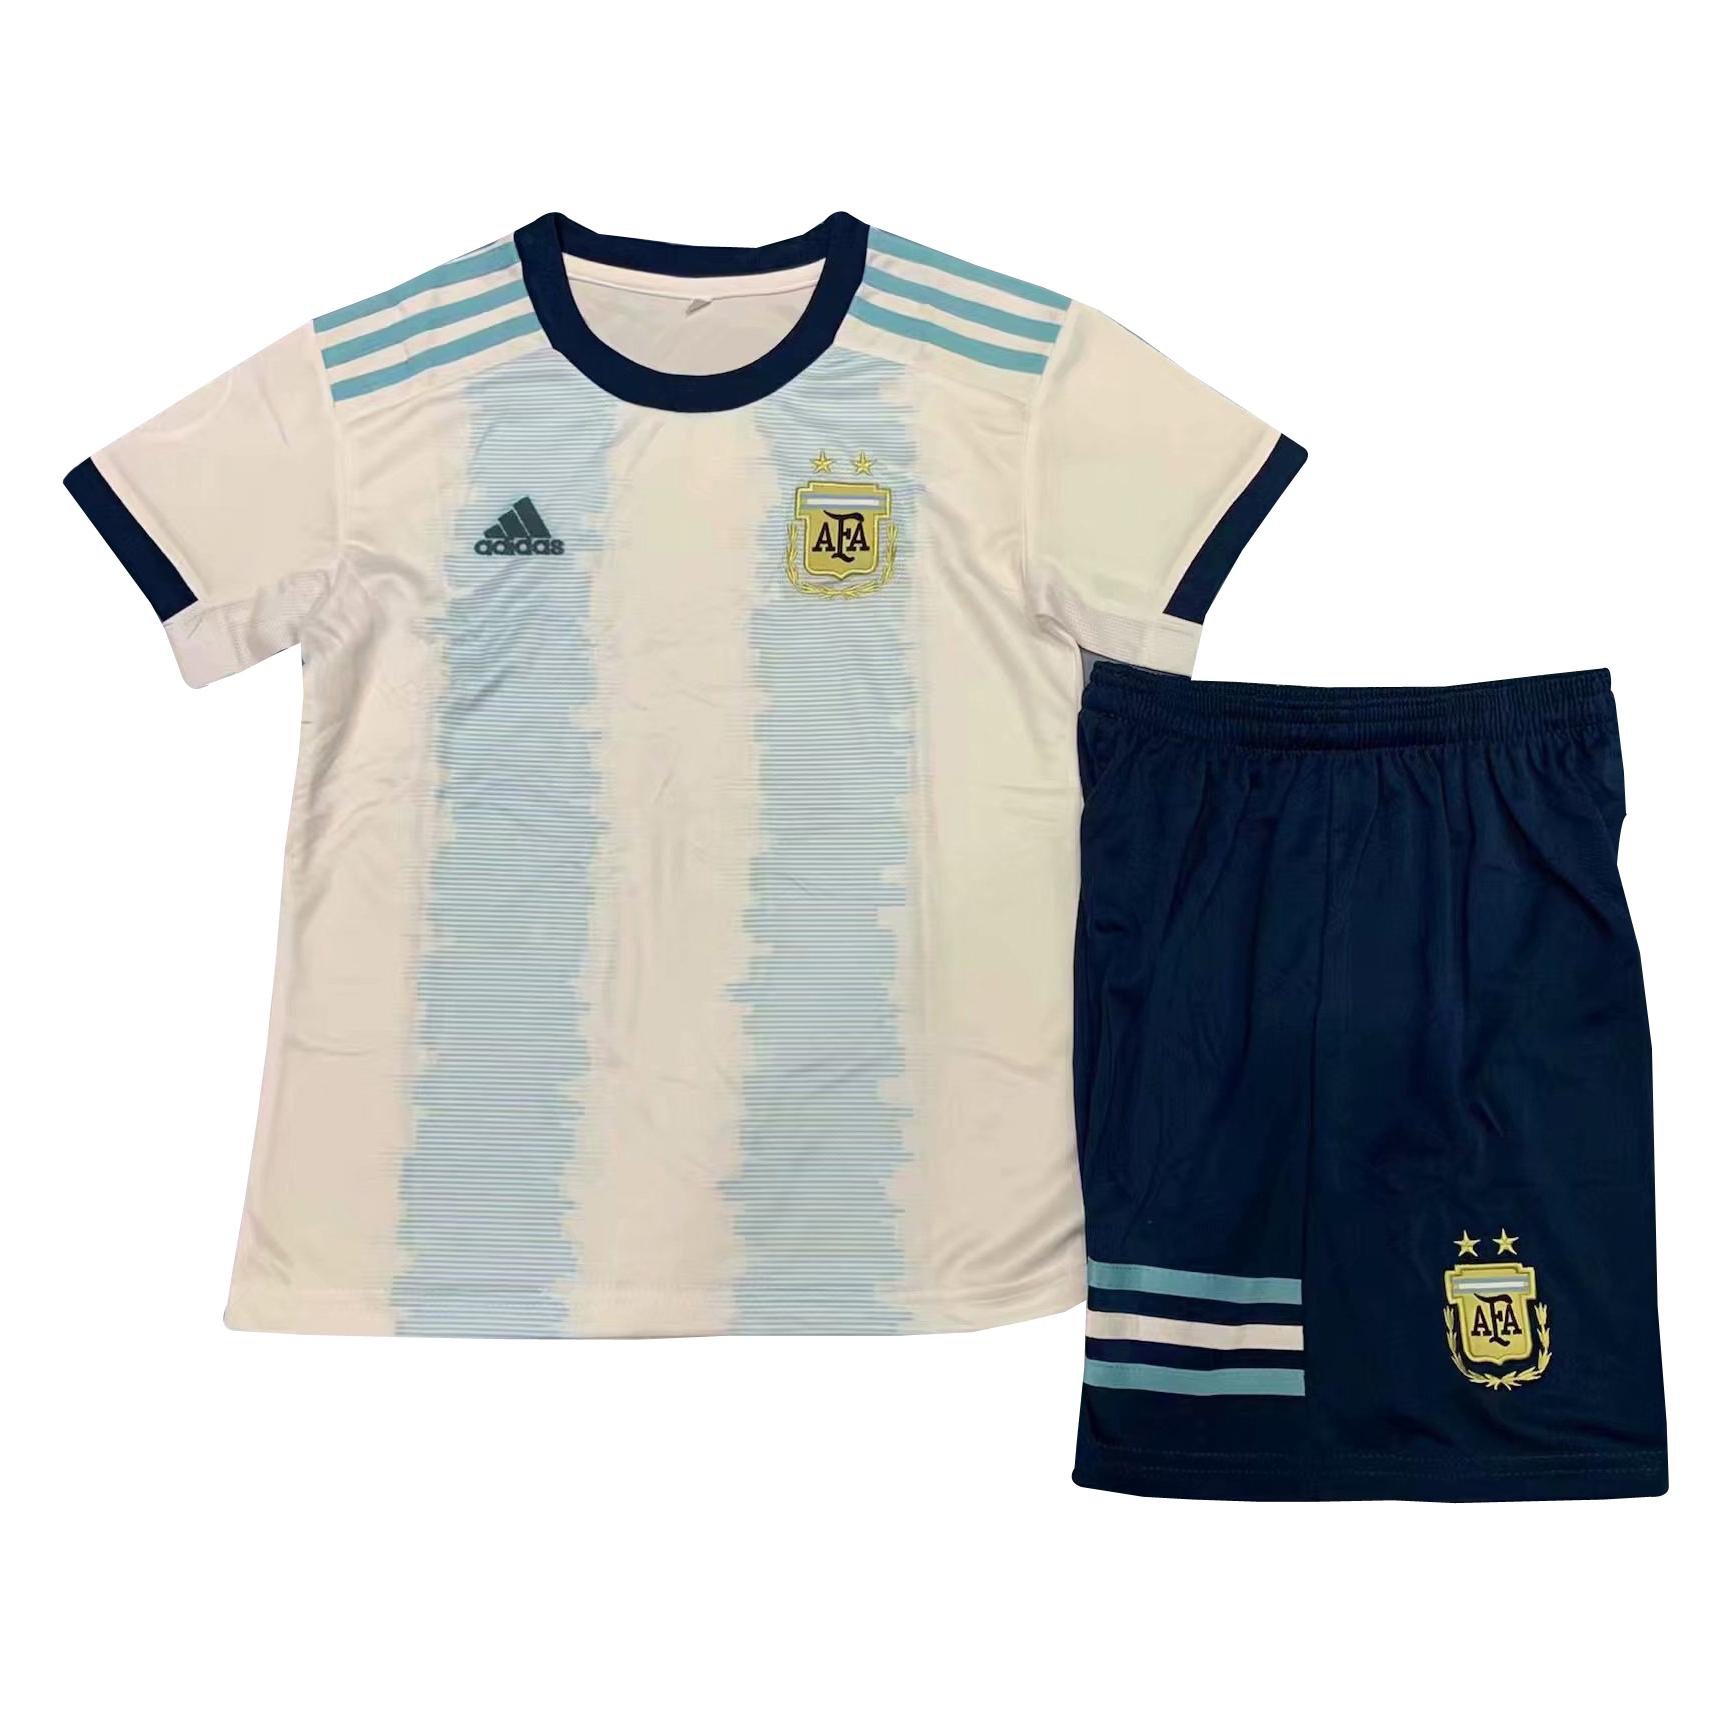 305f55357cd US$ 14.8 - Argentina Copa America 2019 Home Jersey Kids' -  www.fcsoccerworld.com